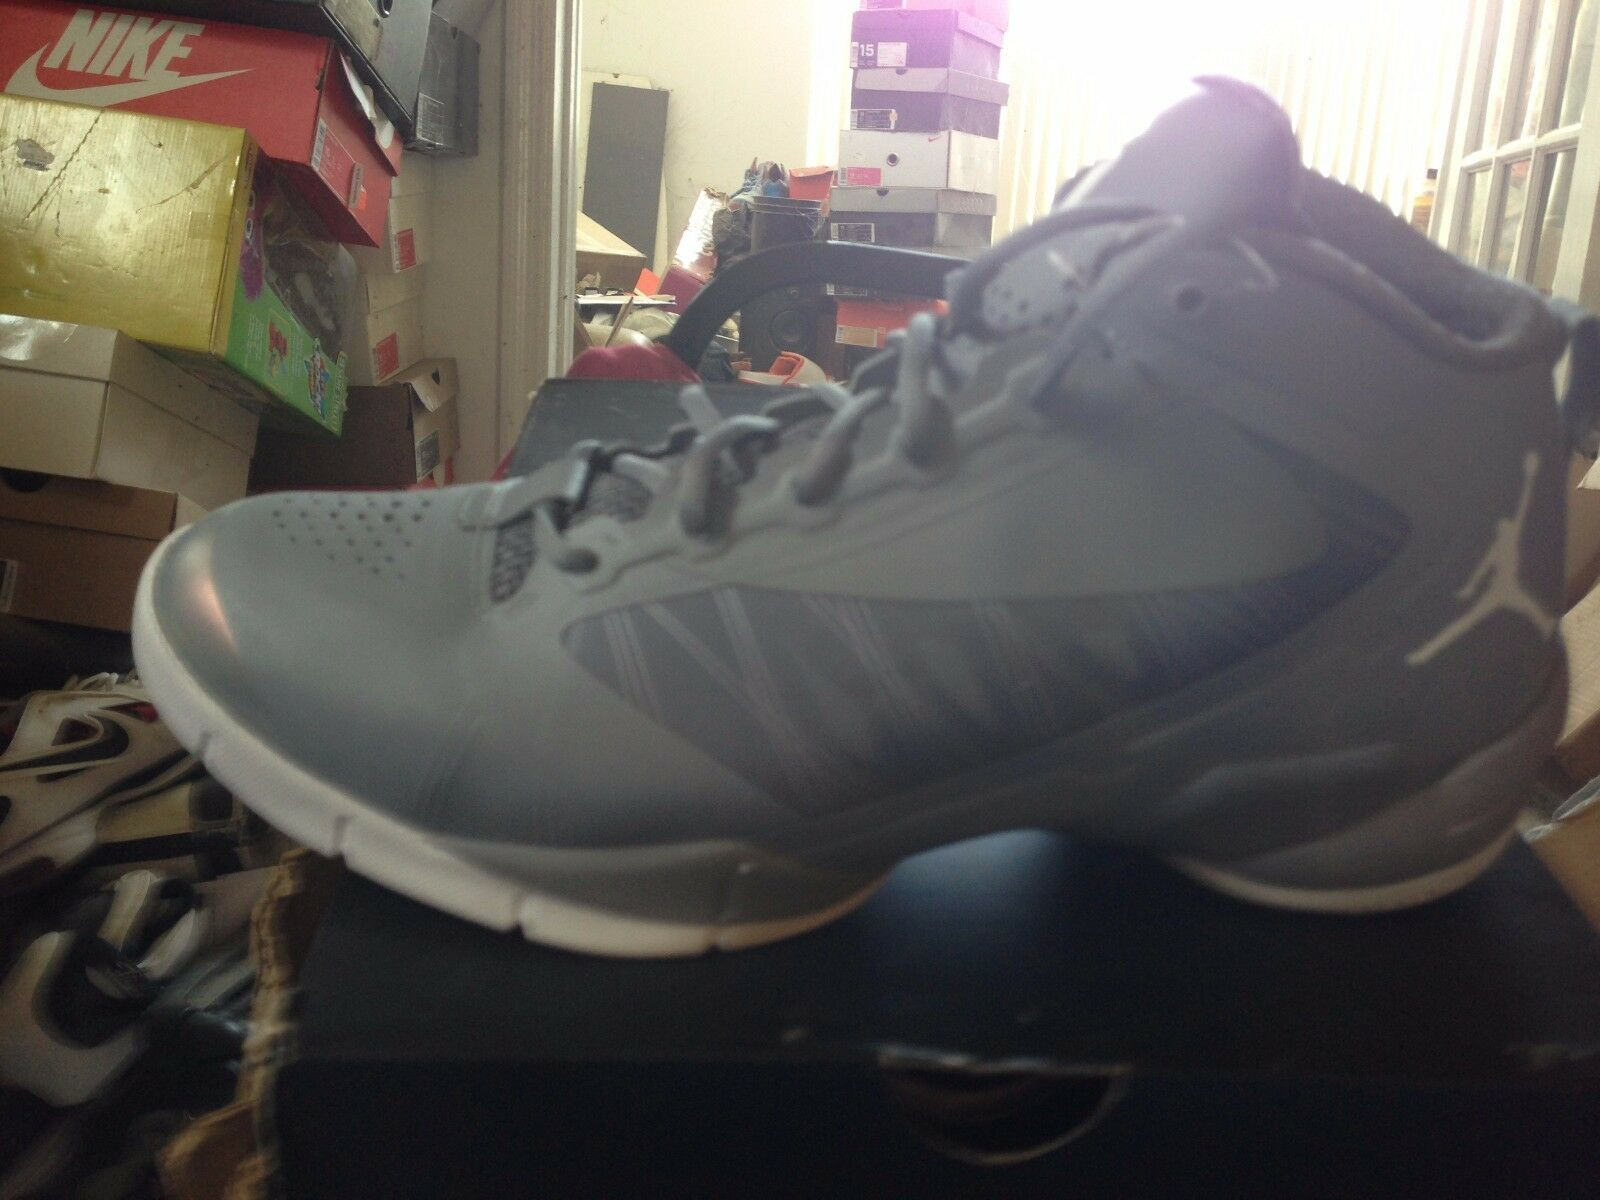 Nike Jordan Fly Wade 2 EV bnib gris / 10,5 WH / Stealth talla 10,5 / 736776